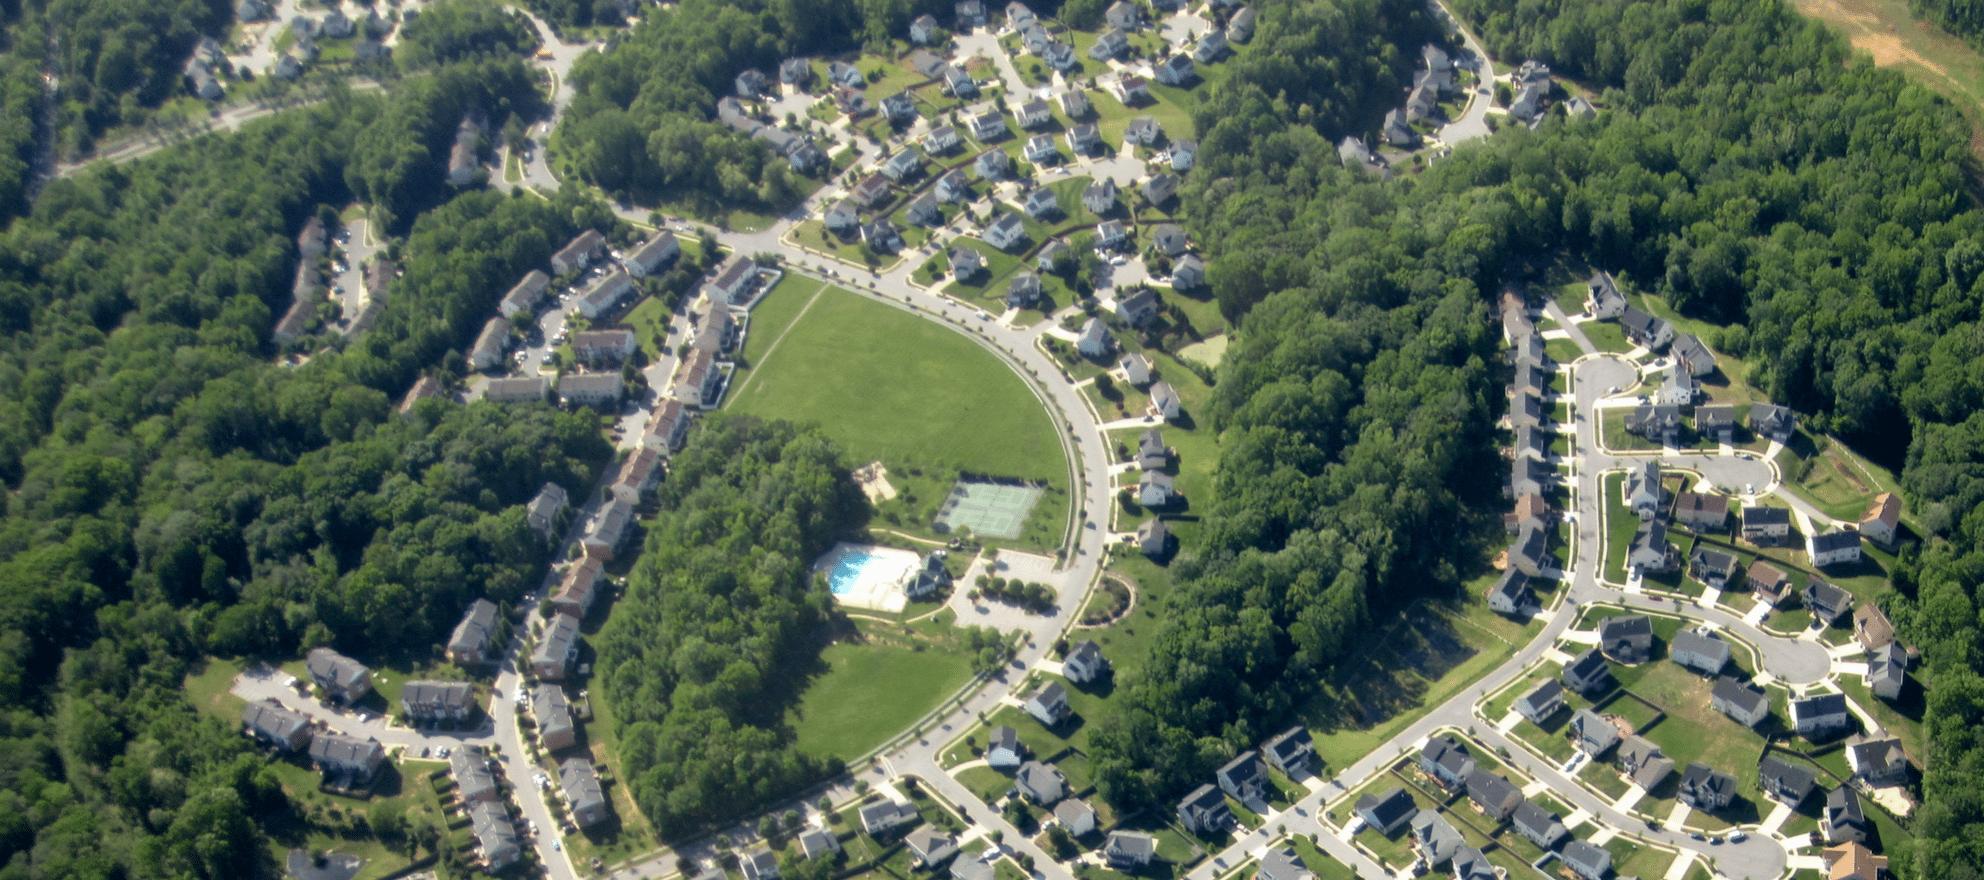 low-density suburbs housing